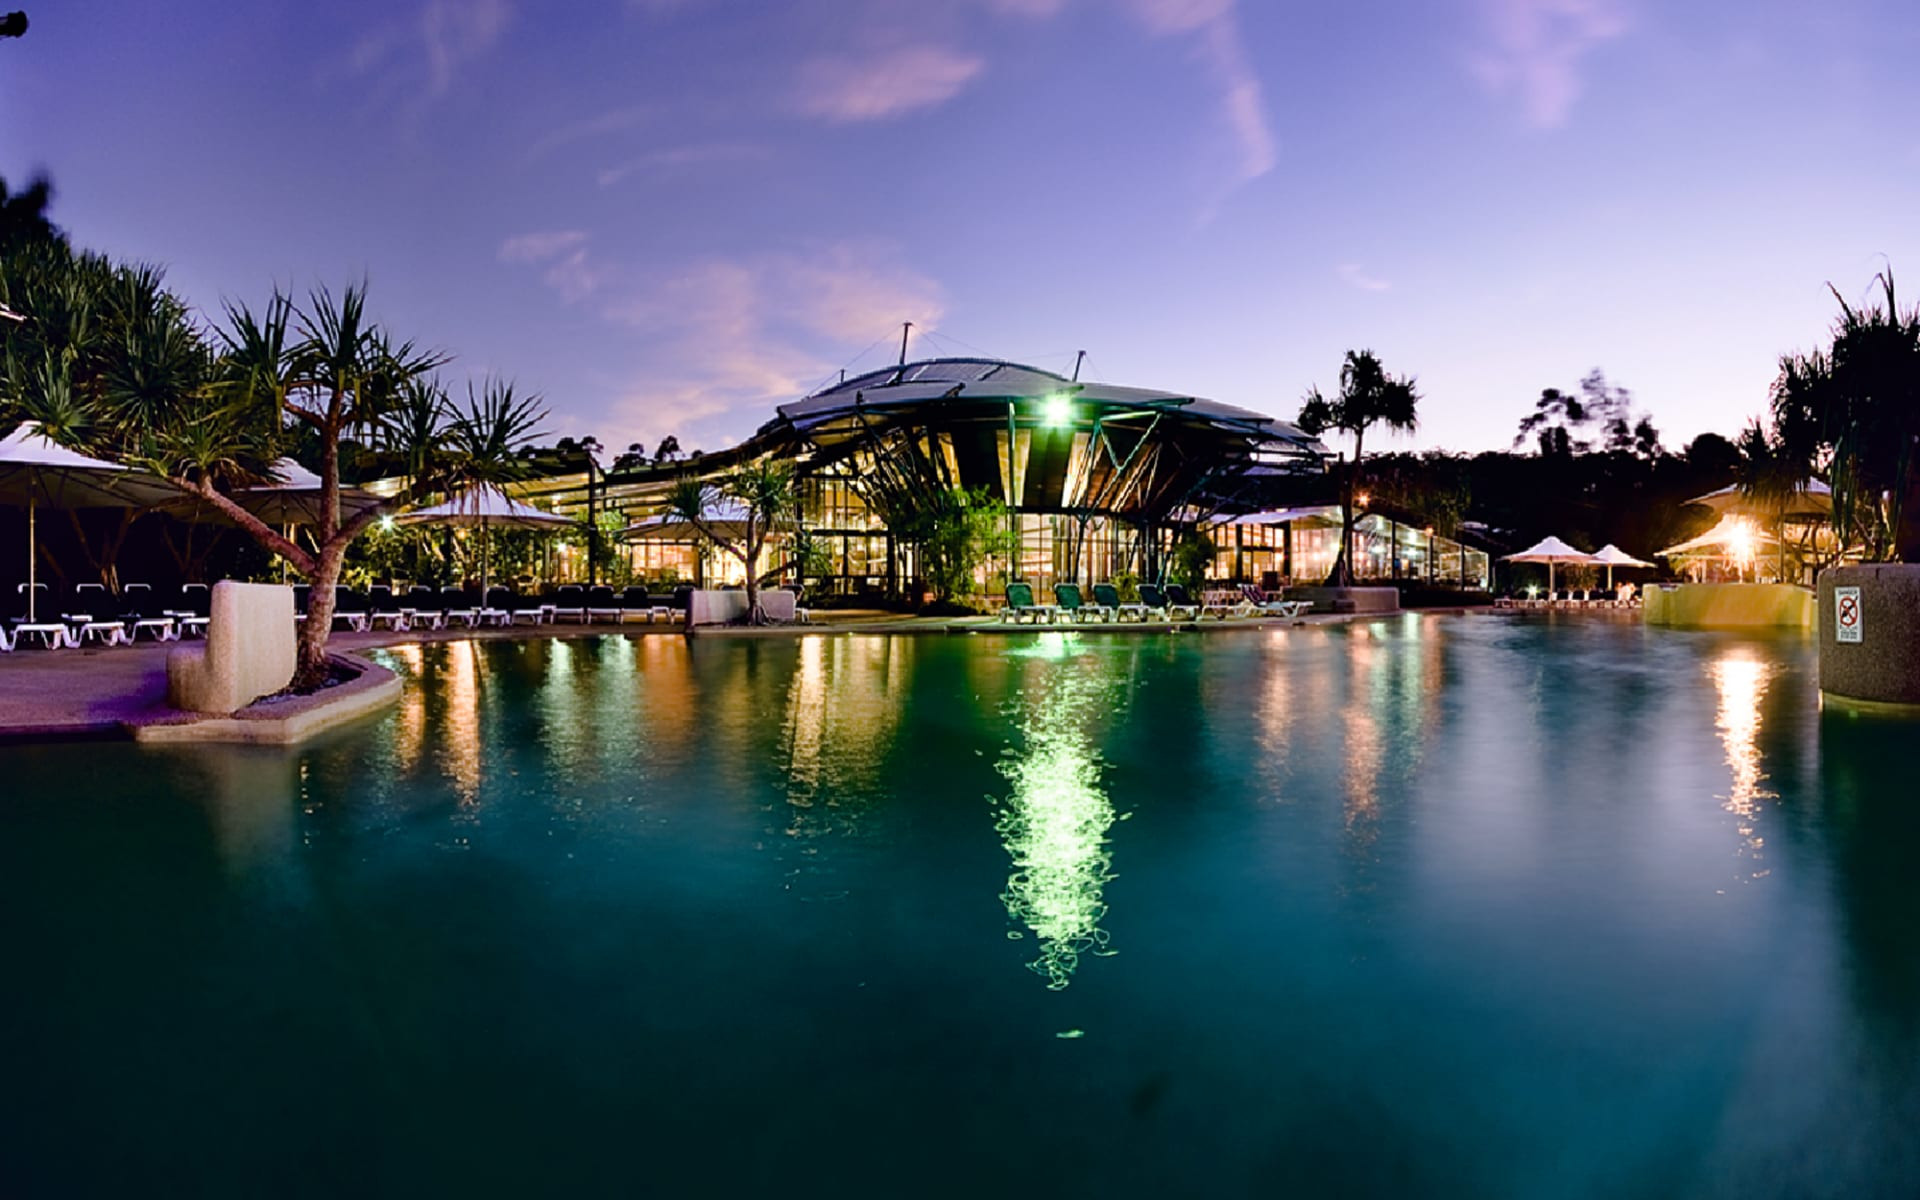 Kingfisher Bay Resort in Fraser Island:  Kingfisher Bay Resort - Overview